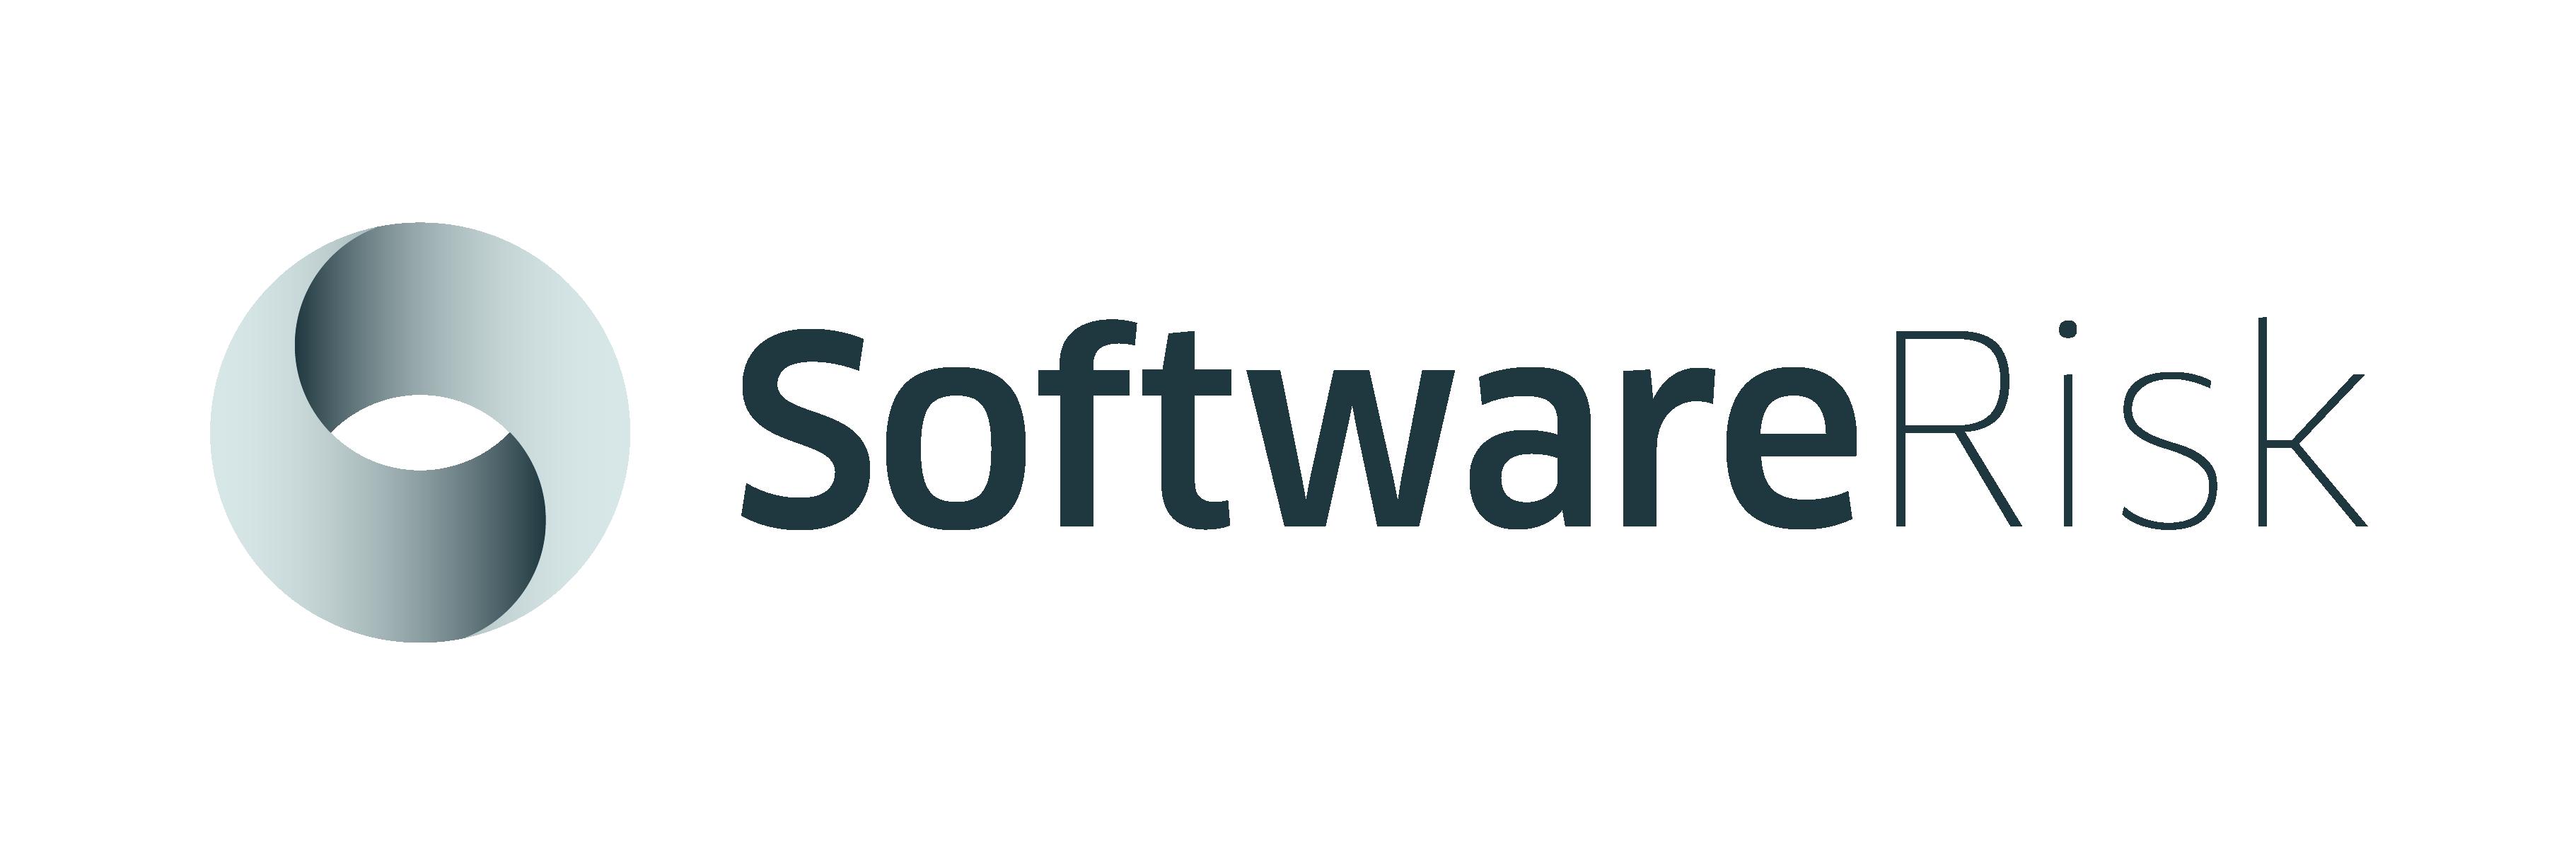 Software Risk logos_all versions-02